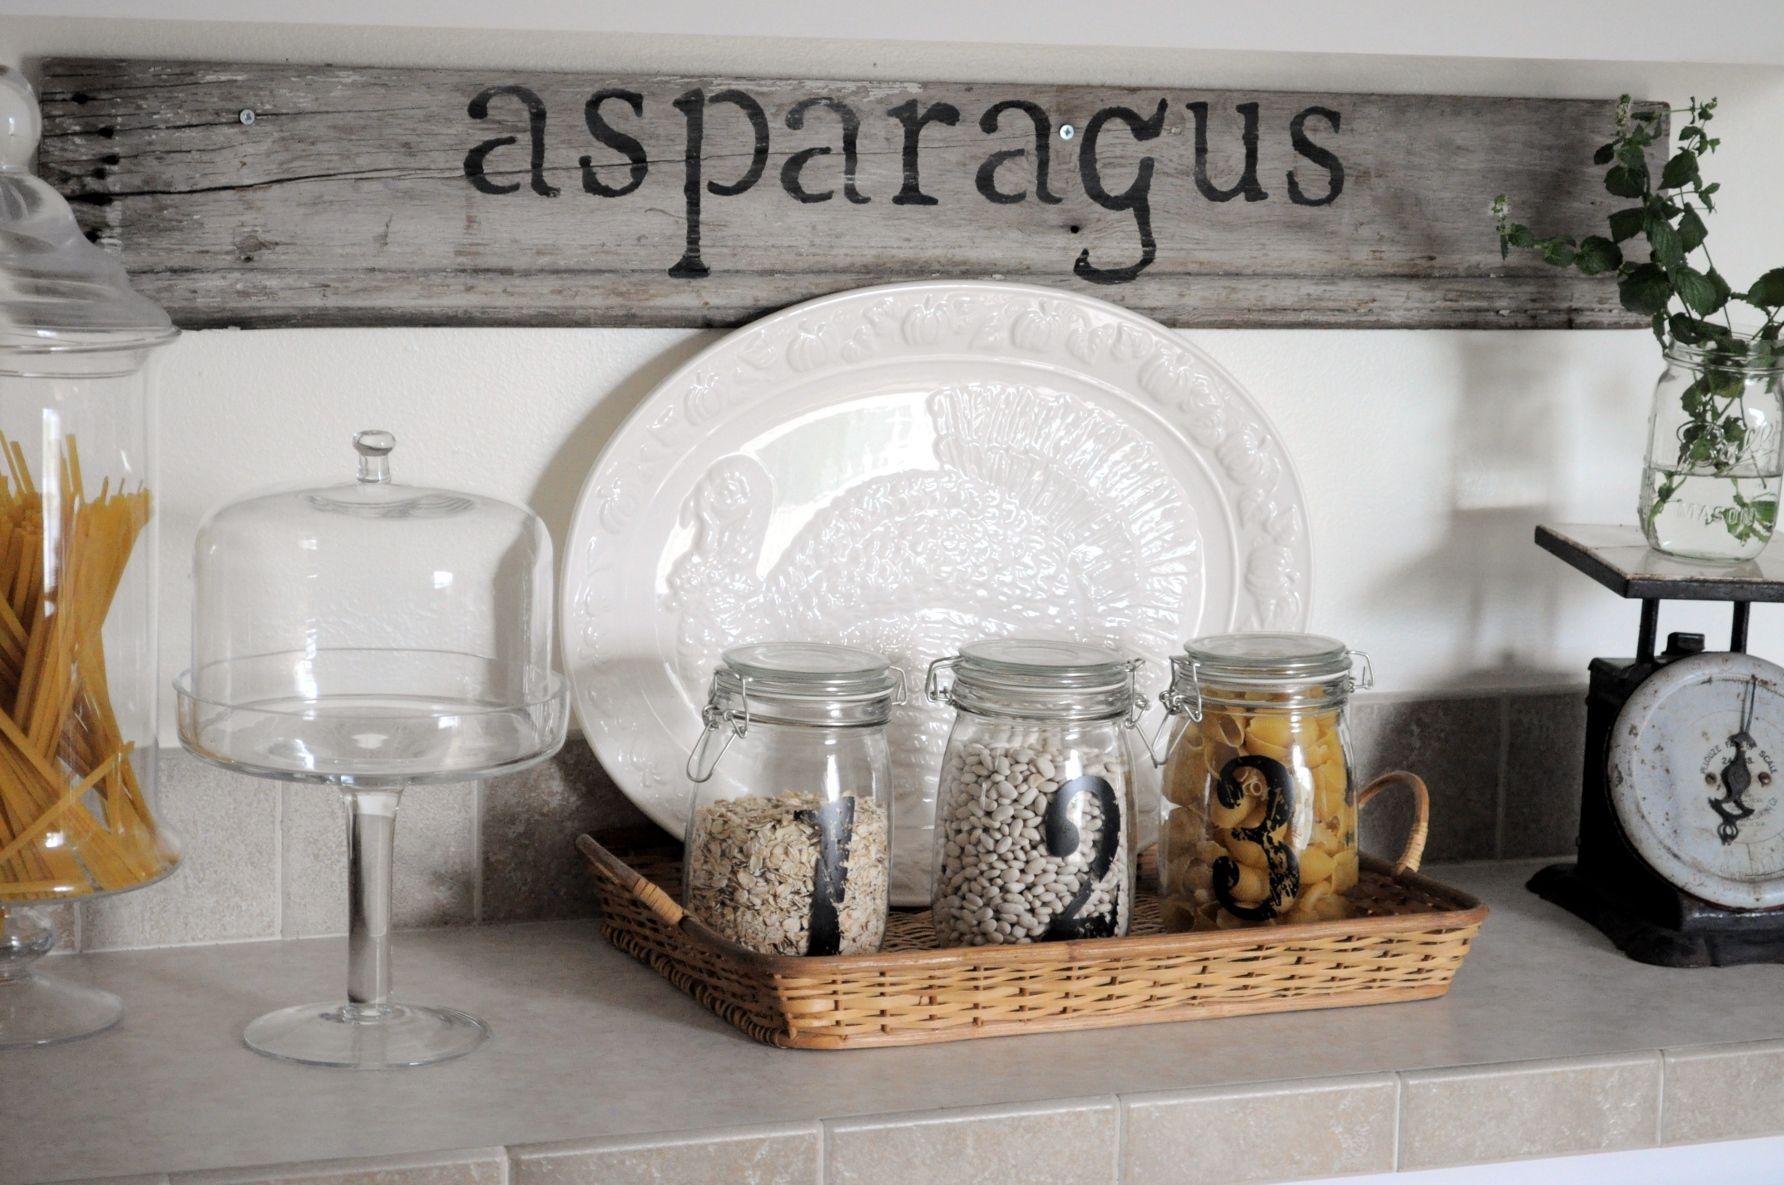 Asparagus sign in kitchen